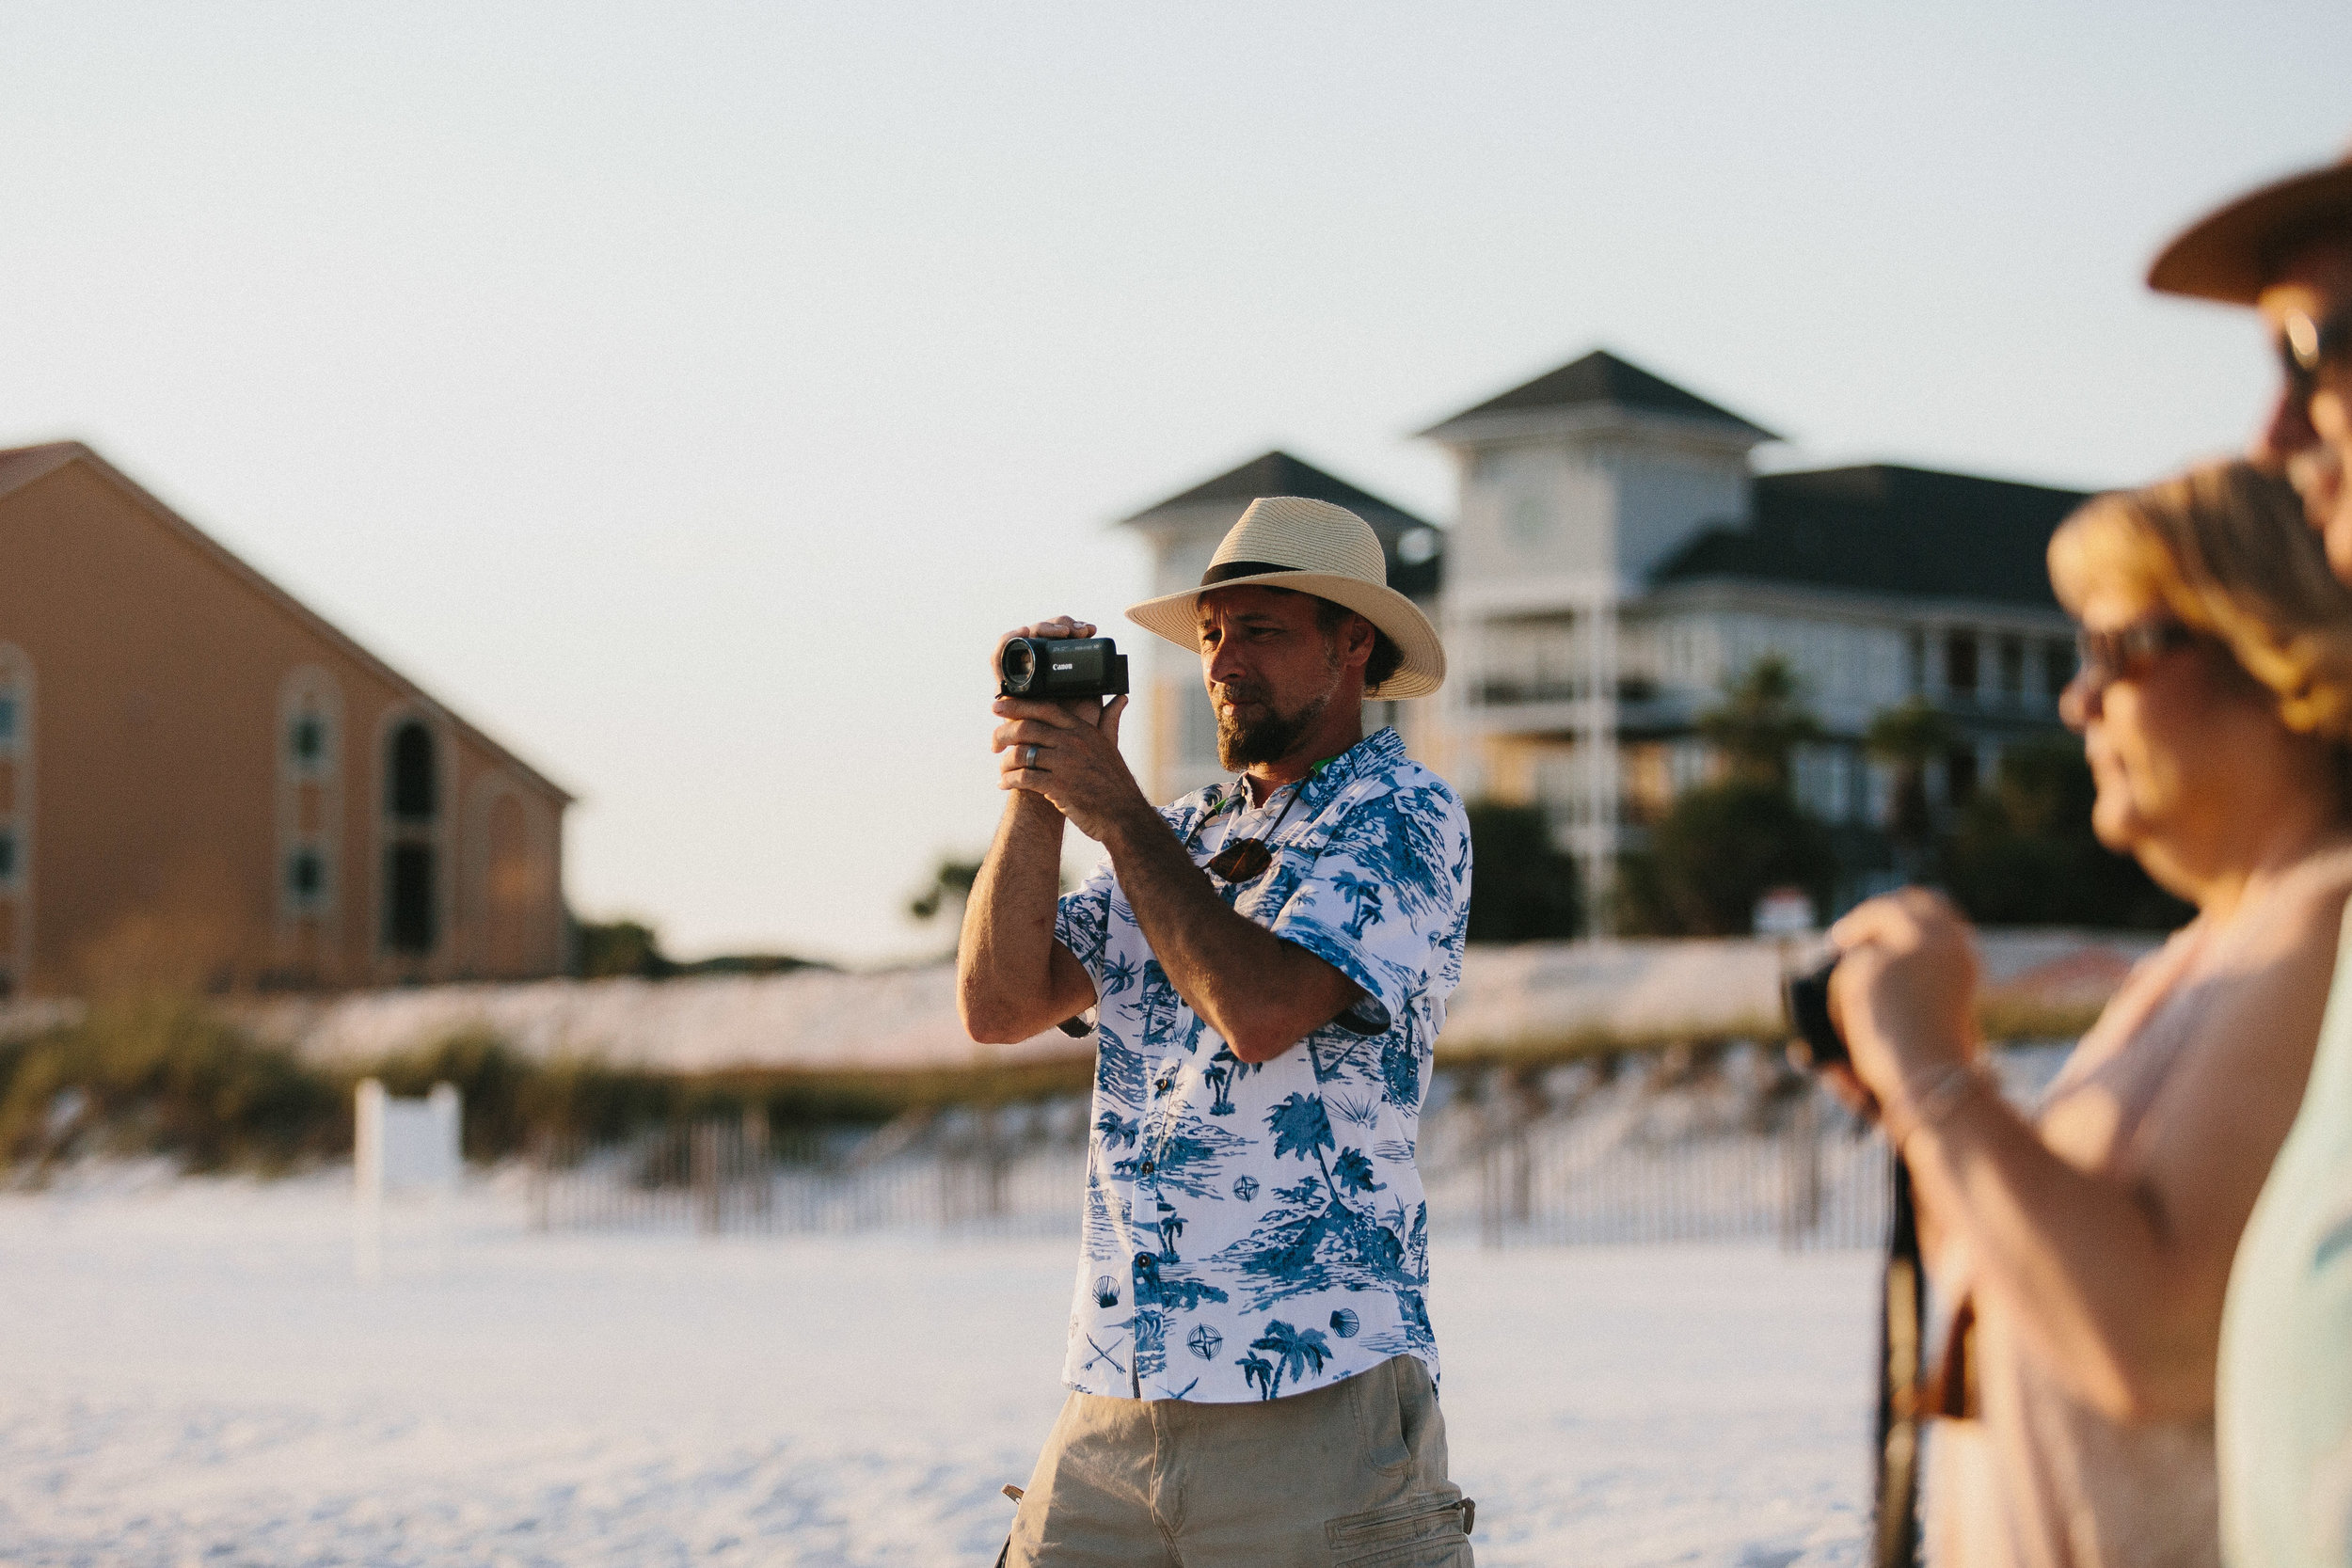 destin_sunset_beach_elopement_intimate_wedding_photographer_florida_documentary_1152.jpg